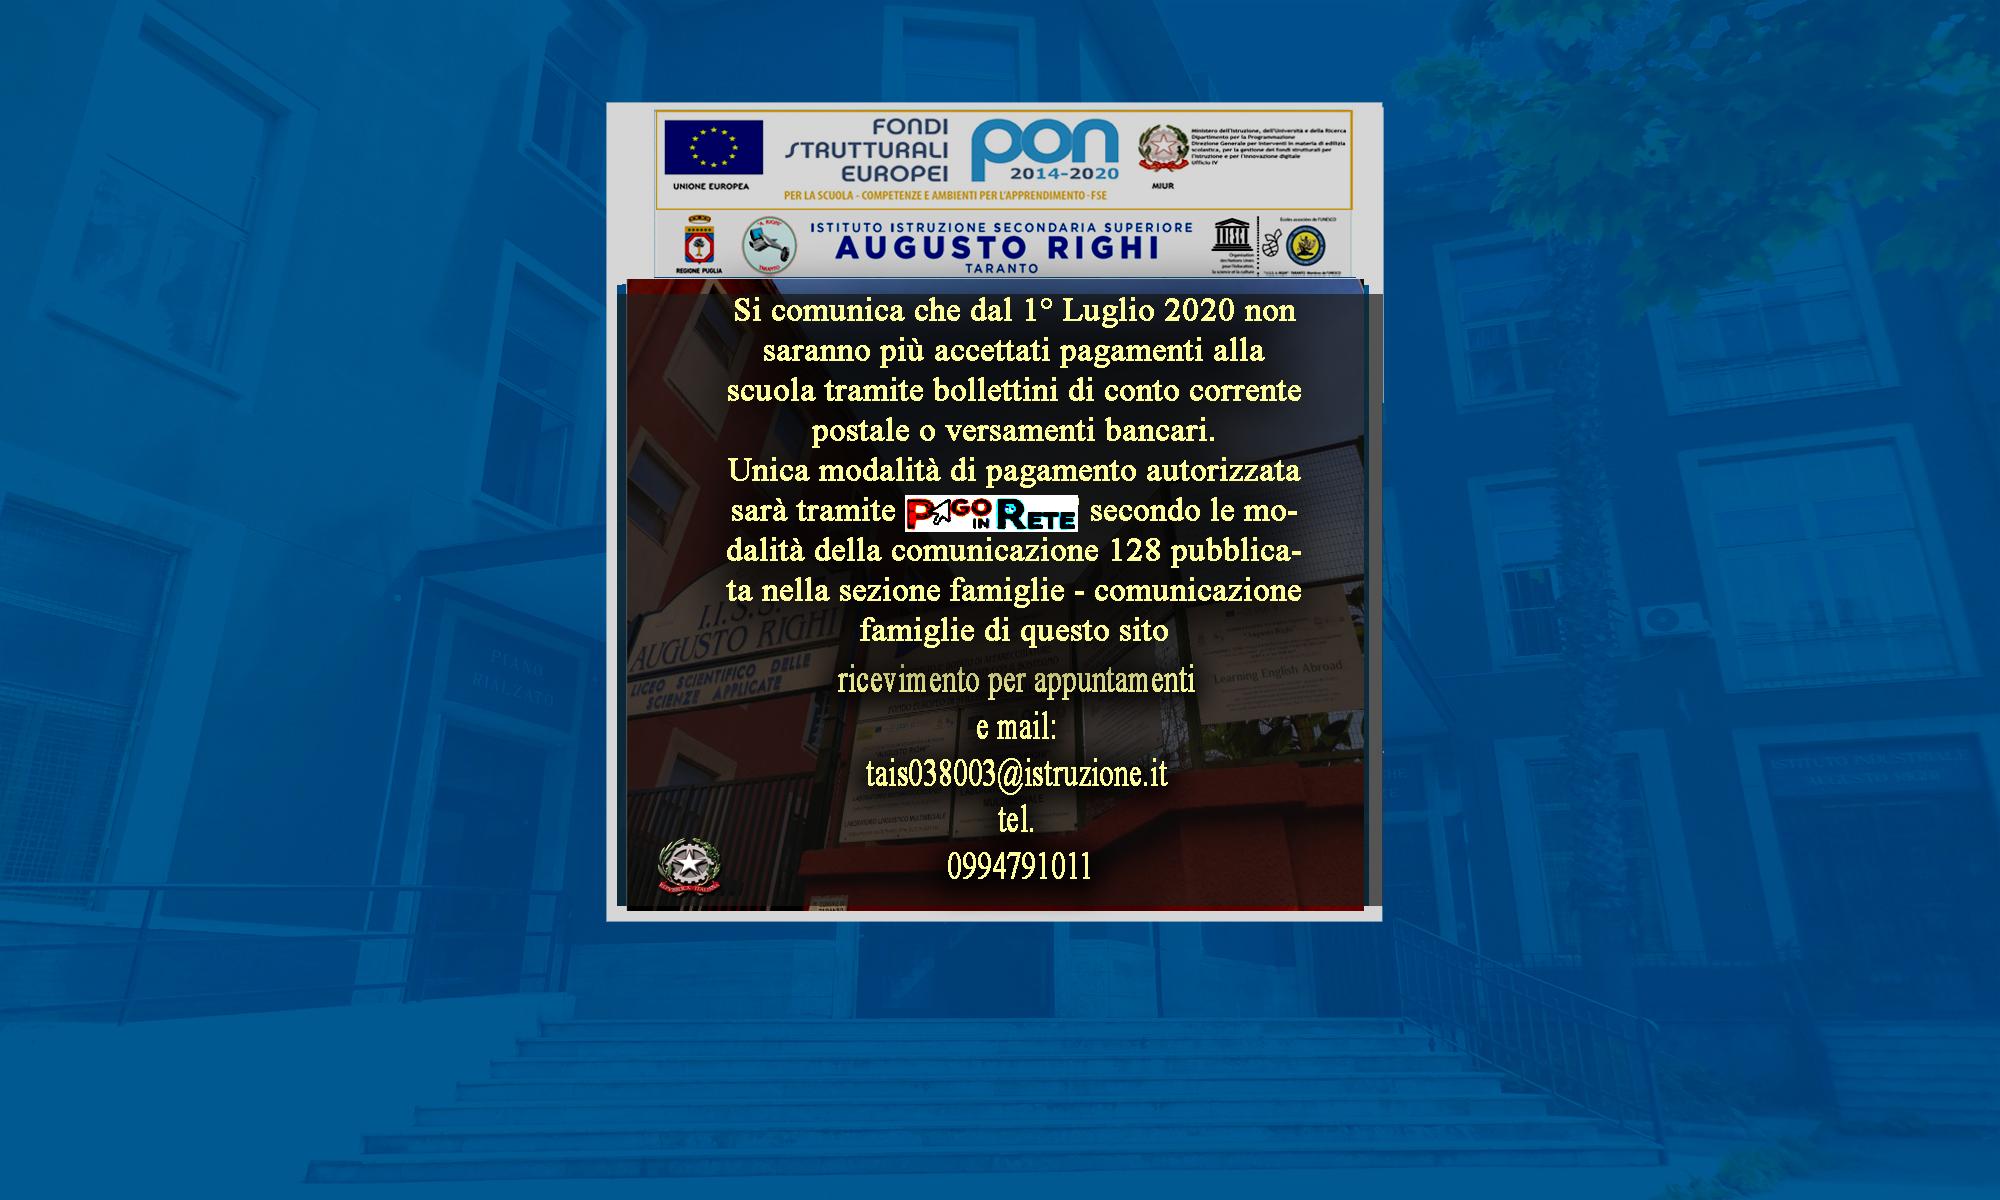 IISS Augusto Righi - Taranto